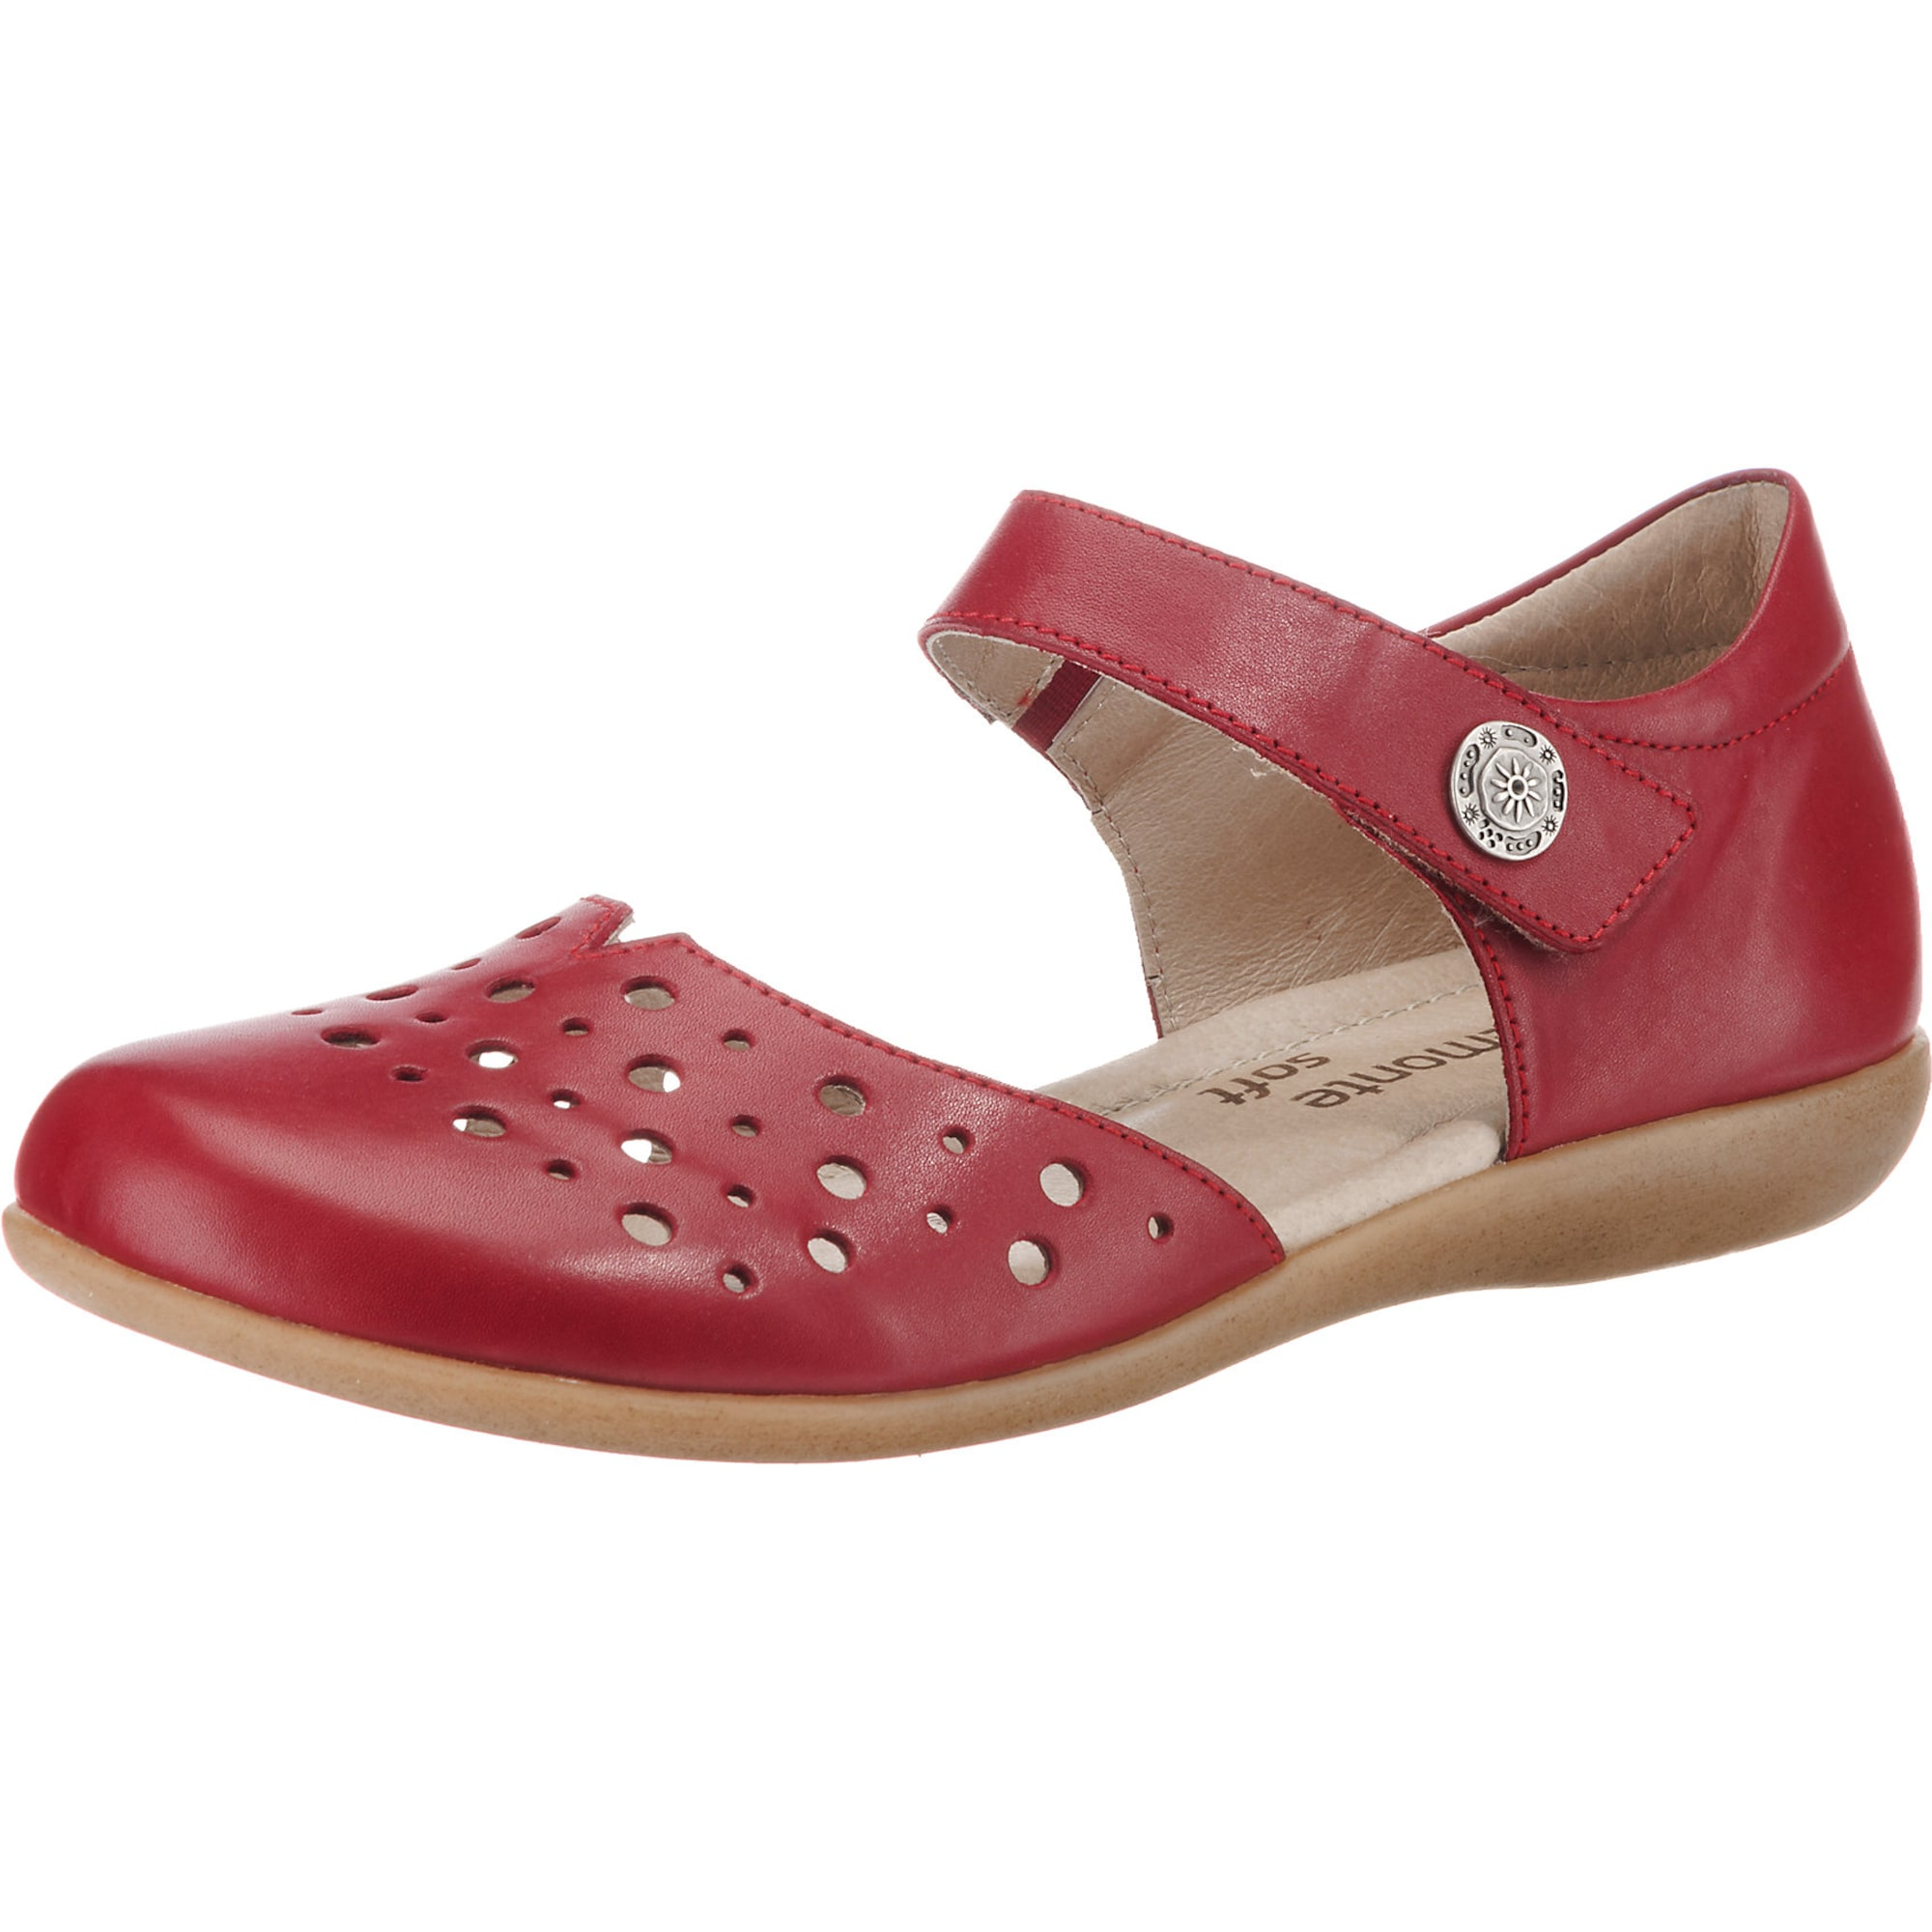 Riemchenballerina | Schuhe > Ballerinas > Riemchenballerinas | Remonte